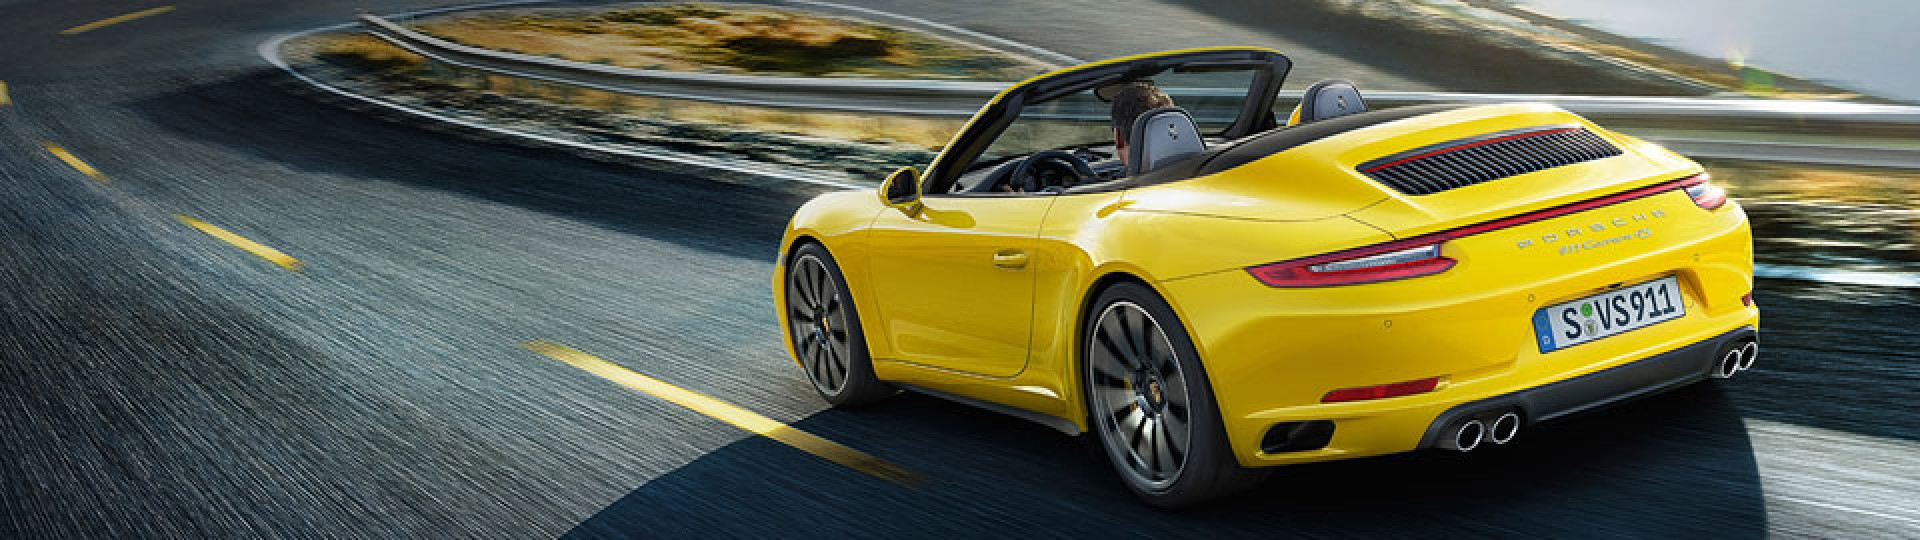 Porsche on the road,